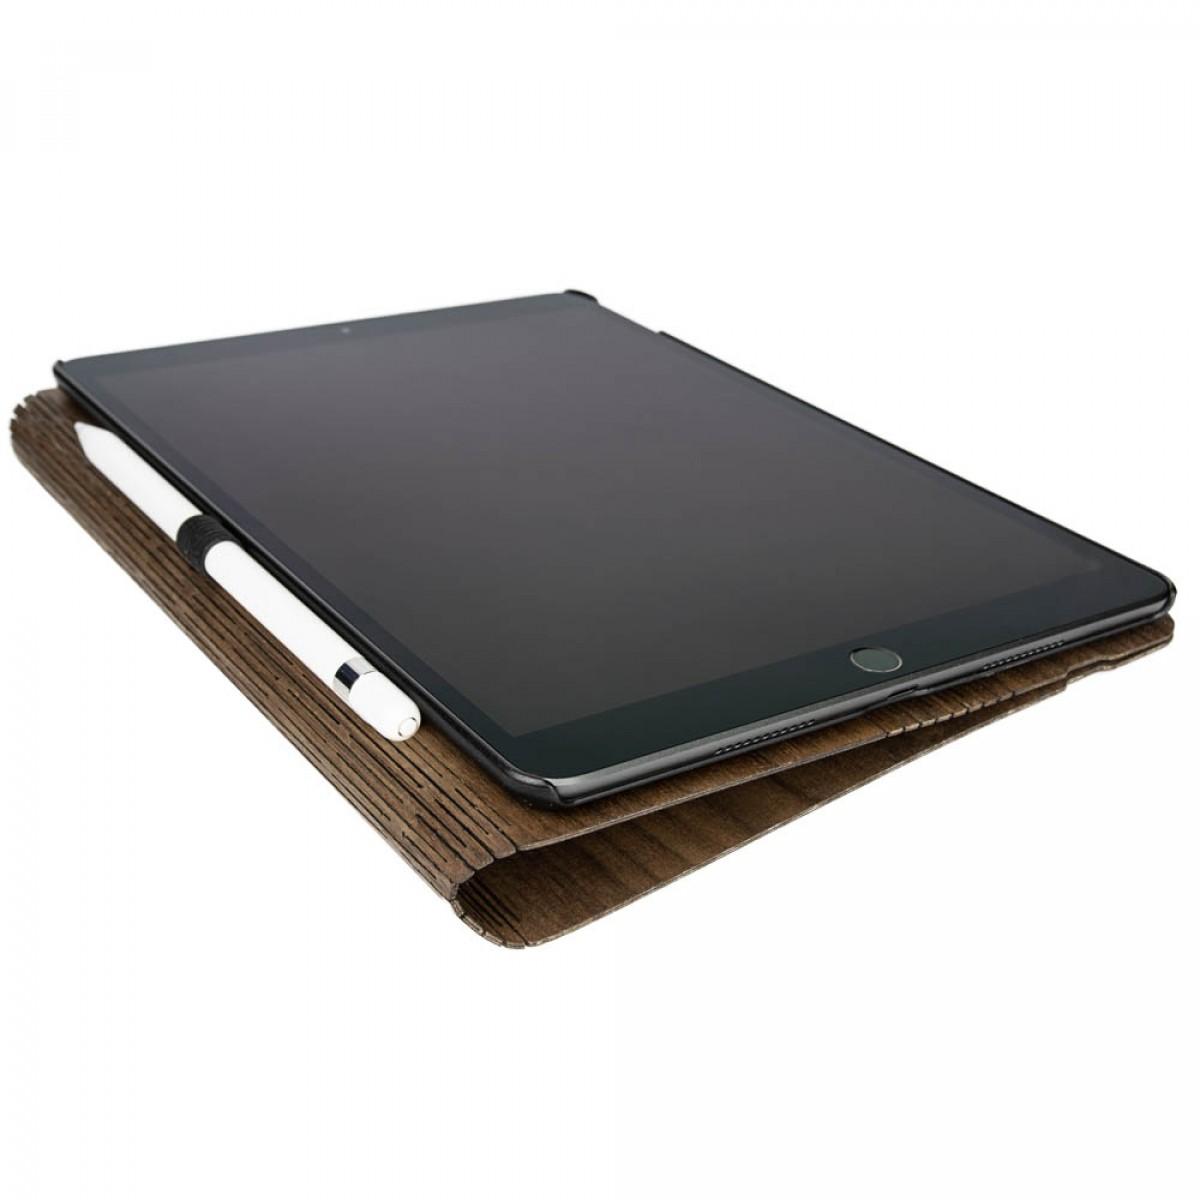 JUNGHOLZ Design WoodCase, Tablet, Walnuss, iPad Pro 10.5''